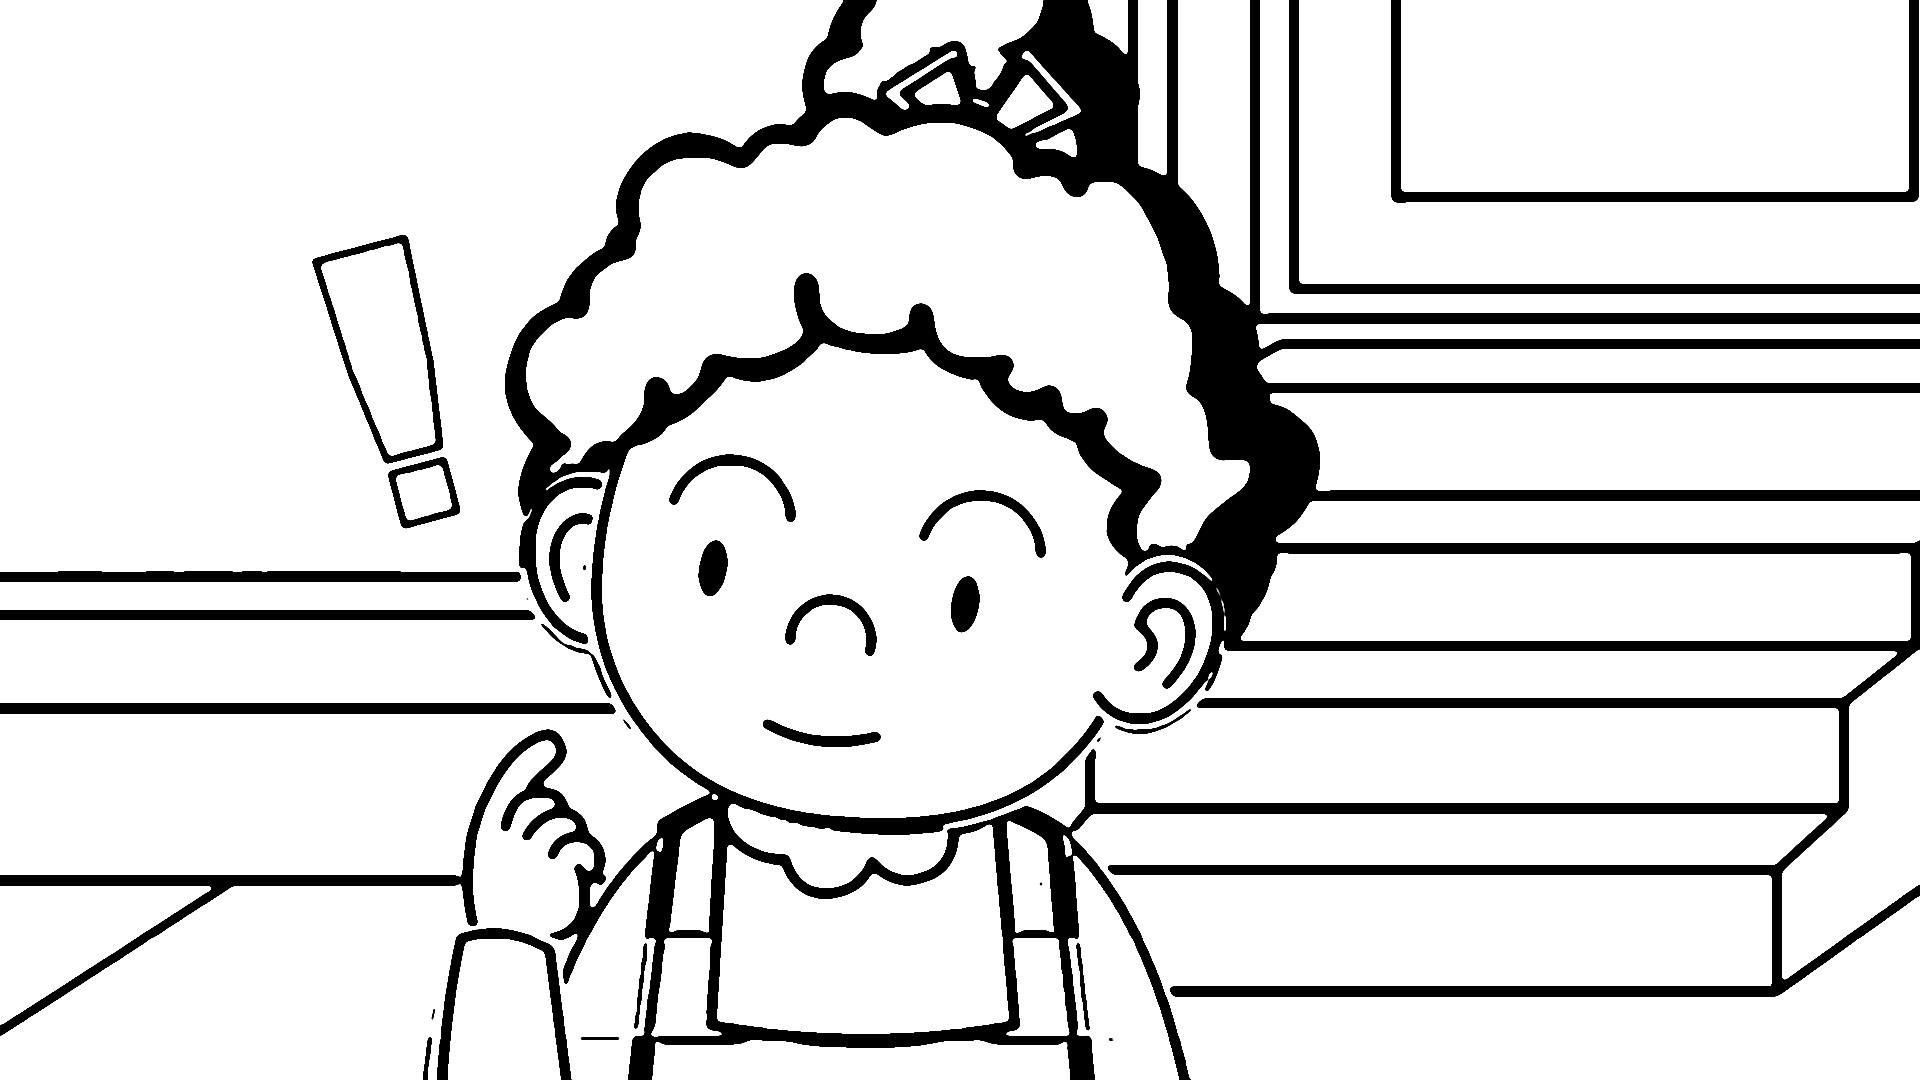 Speaking Cartoon Kids Coloring Page 24